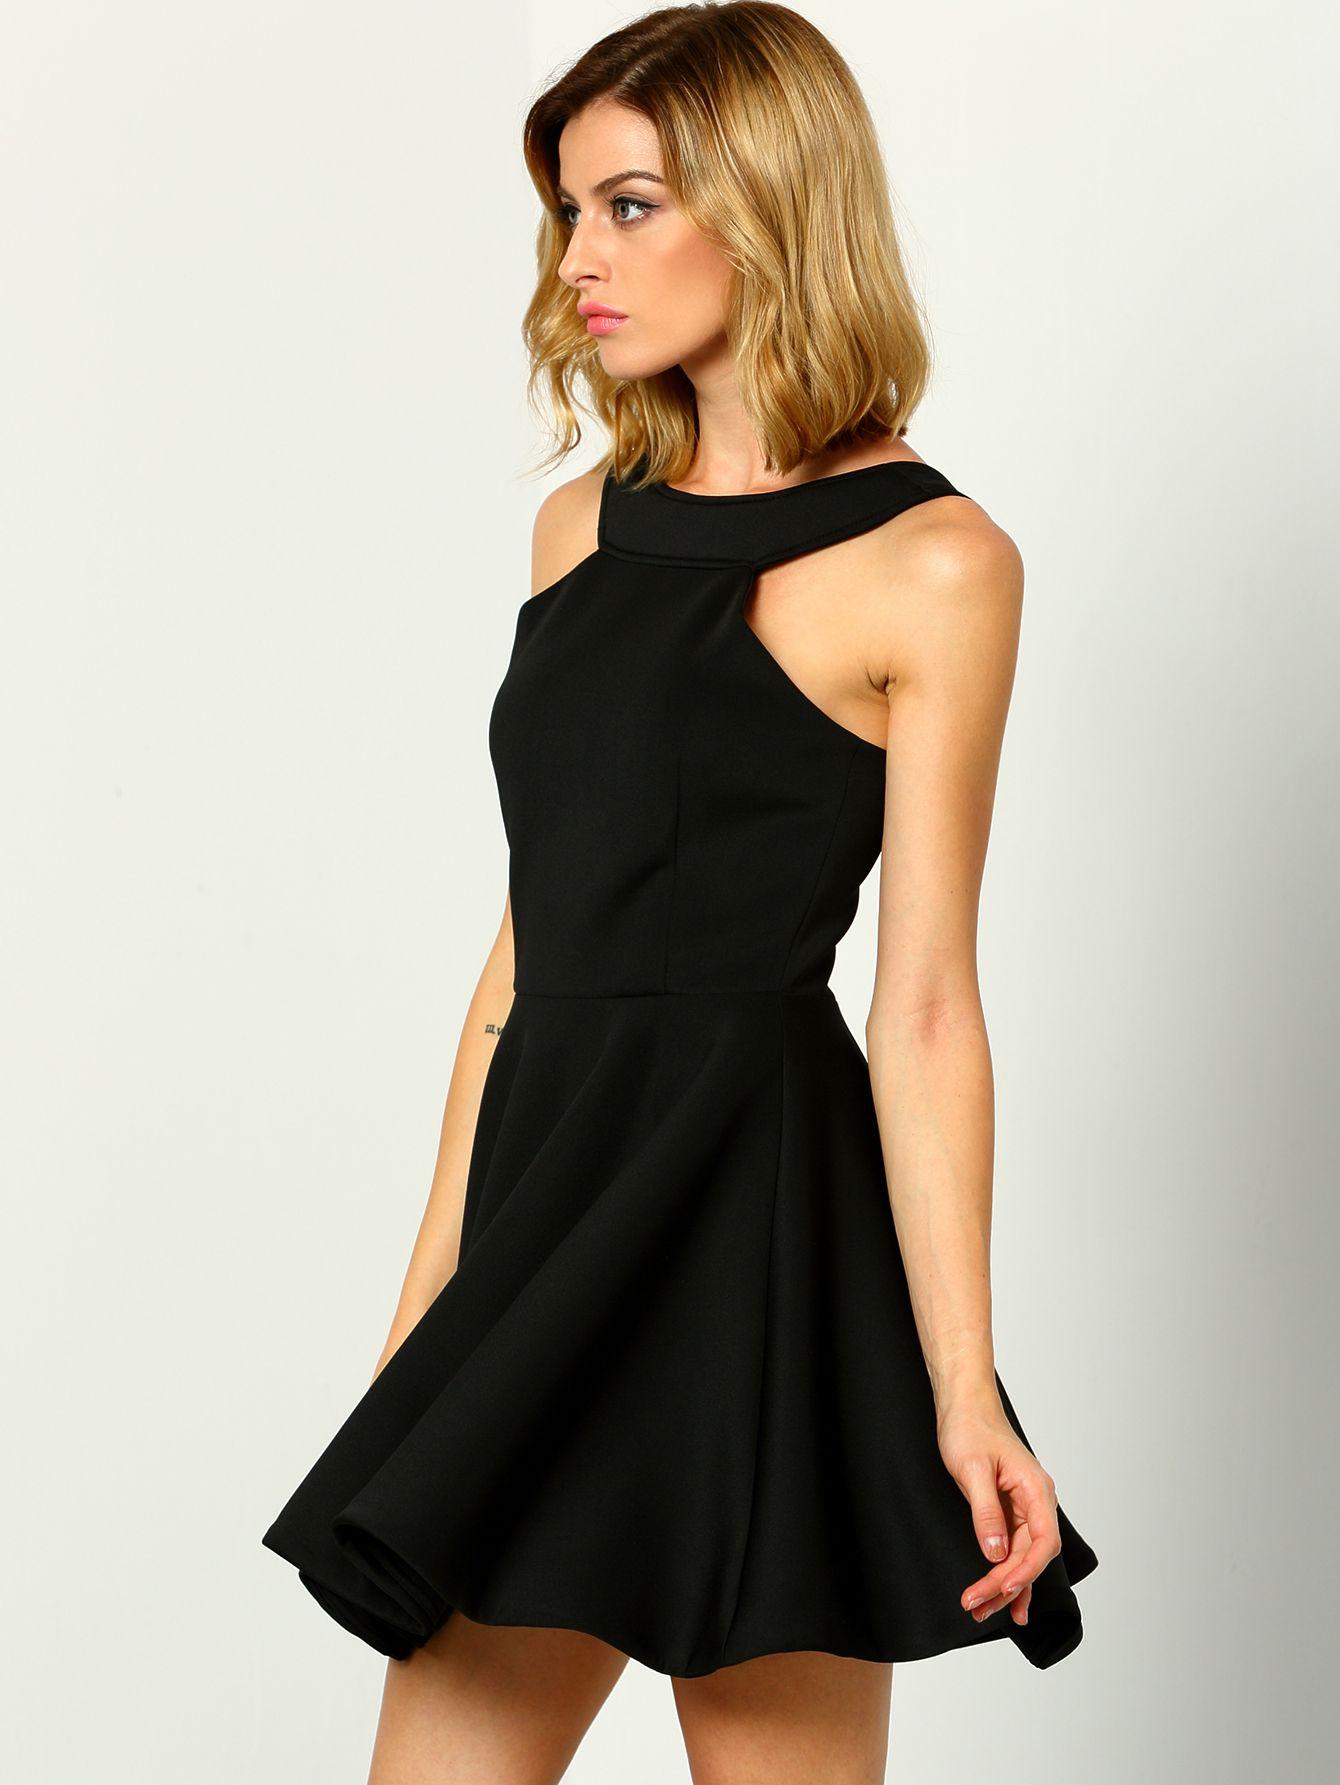 Black Halter Backless Flare Dress Shein Sheinside Black Graduation Dress Dresses Grad Dresses [ 1785 x 1340 Pixel ]